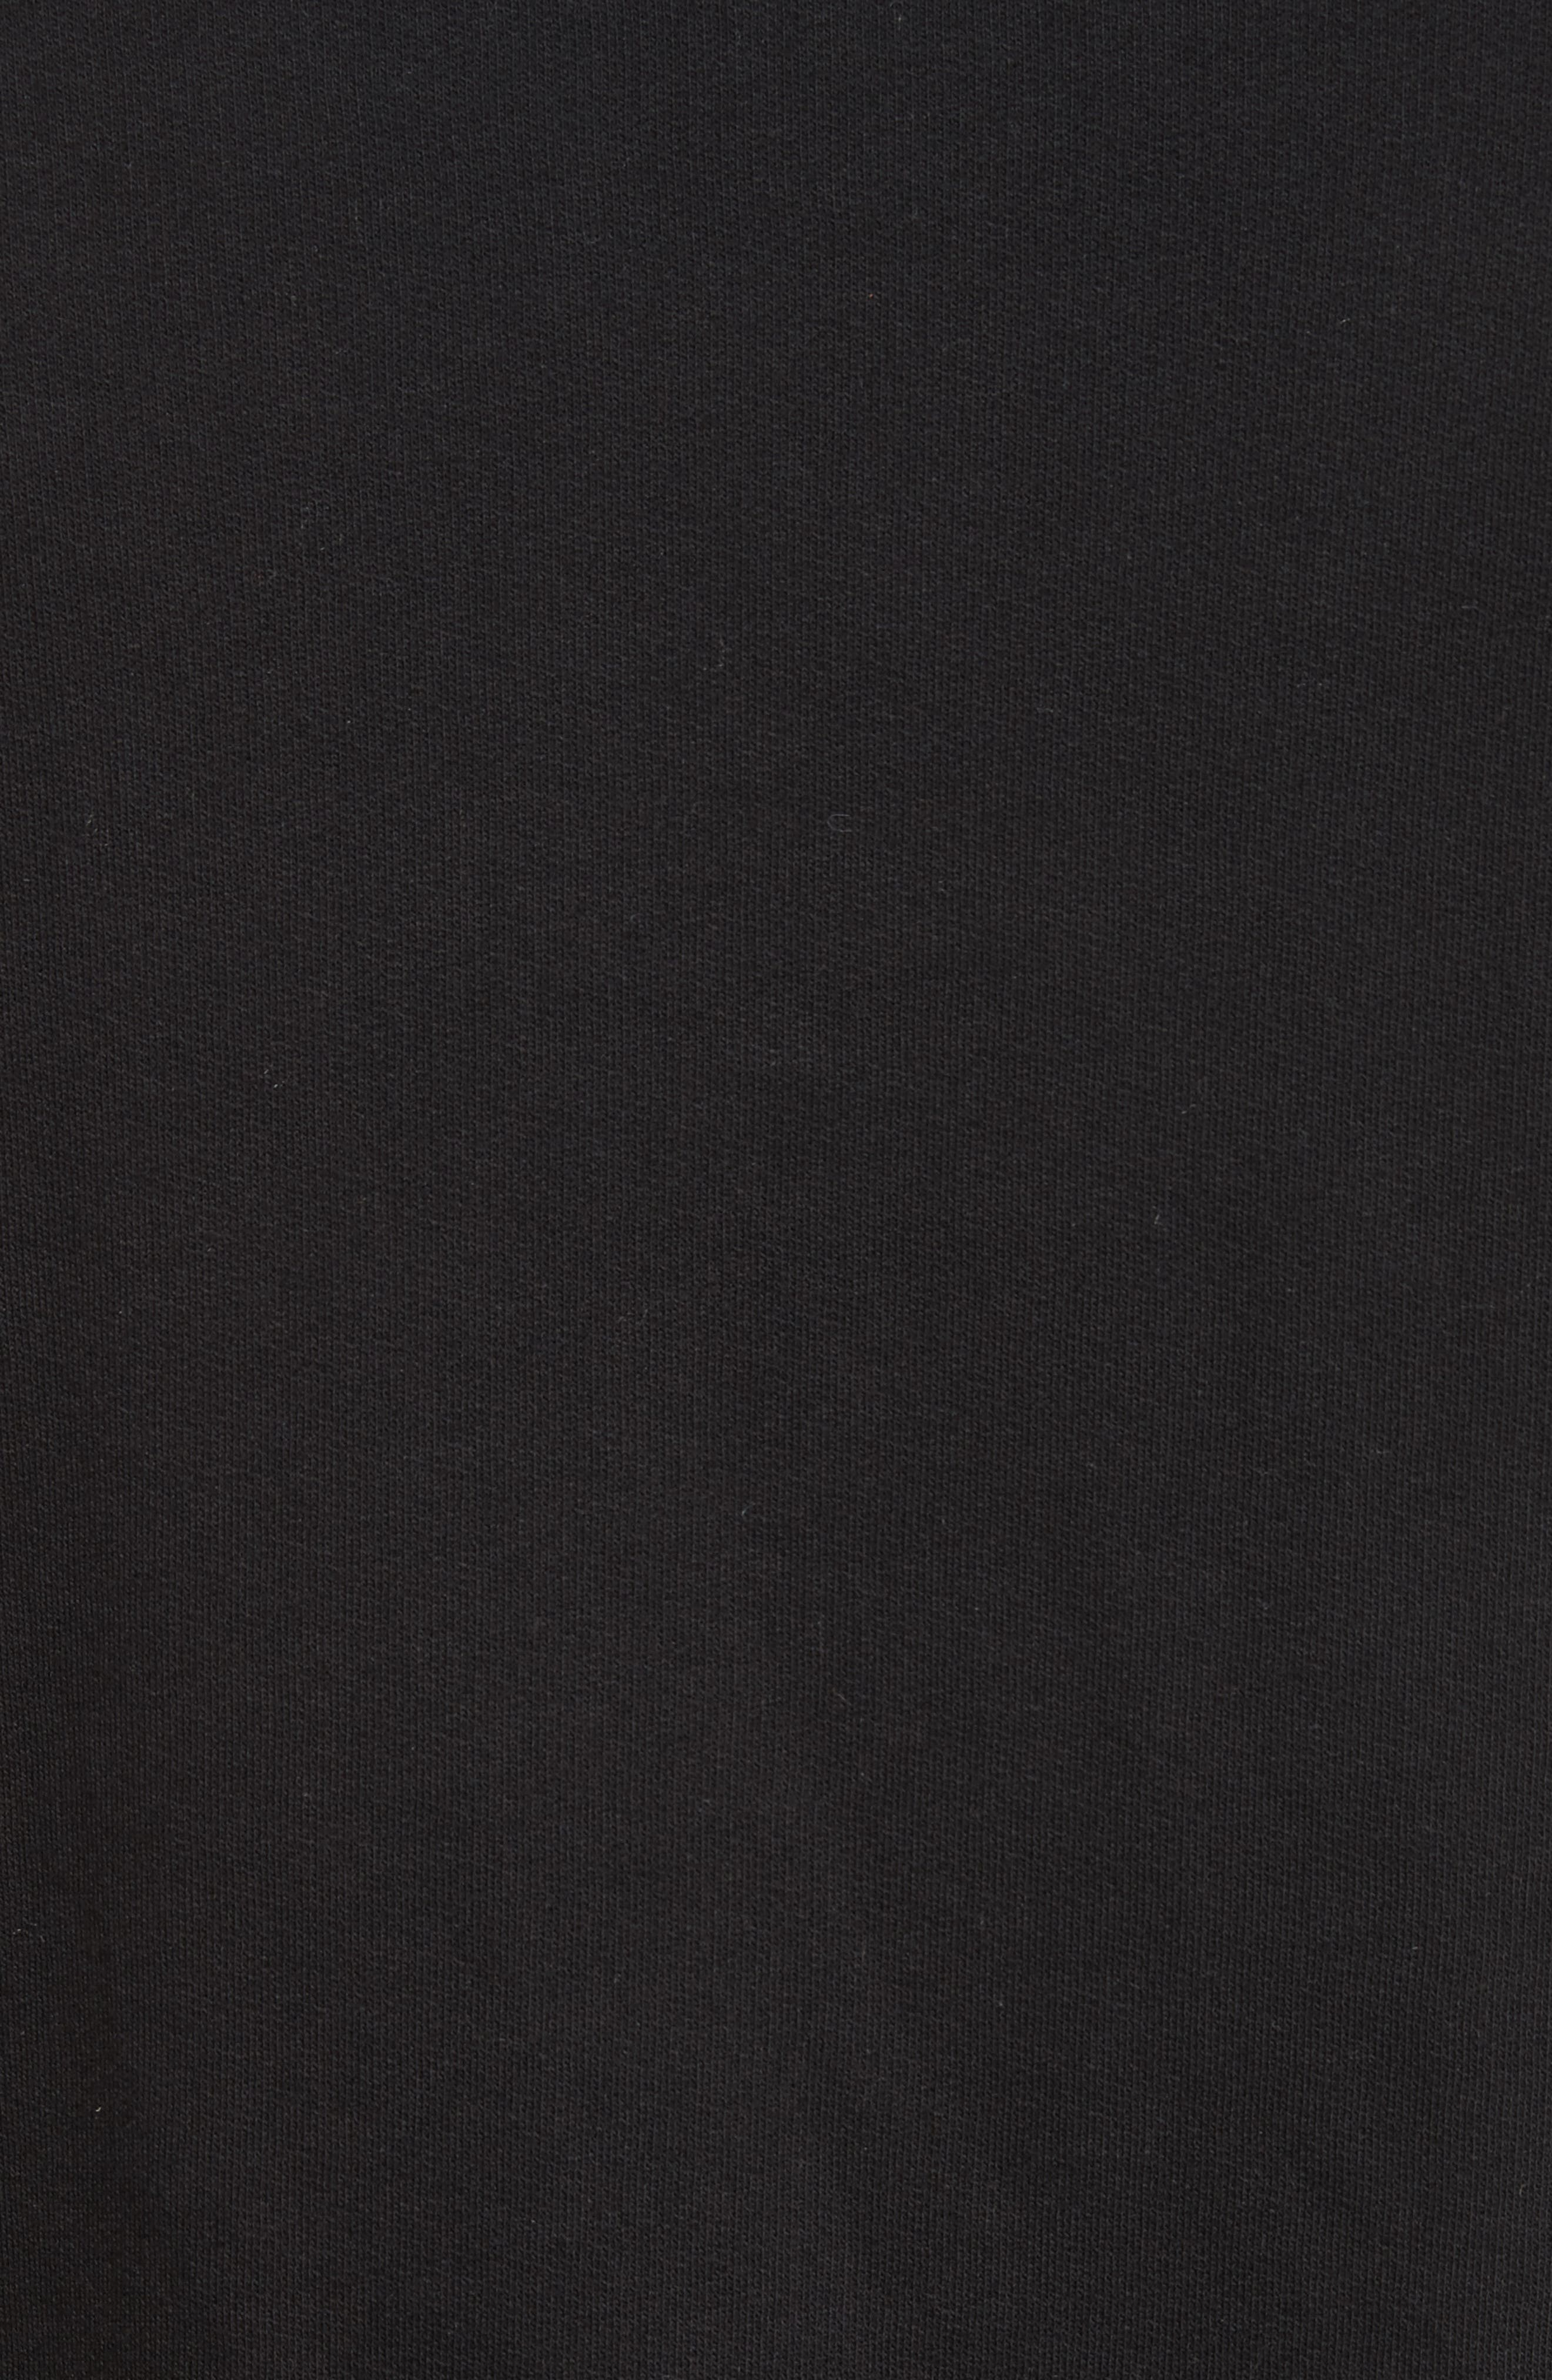 Standard Issue Crewneck Sweatshirt,                             Alternate thumbnail 5, color,                             001